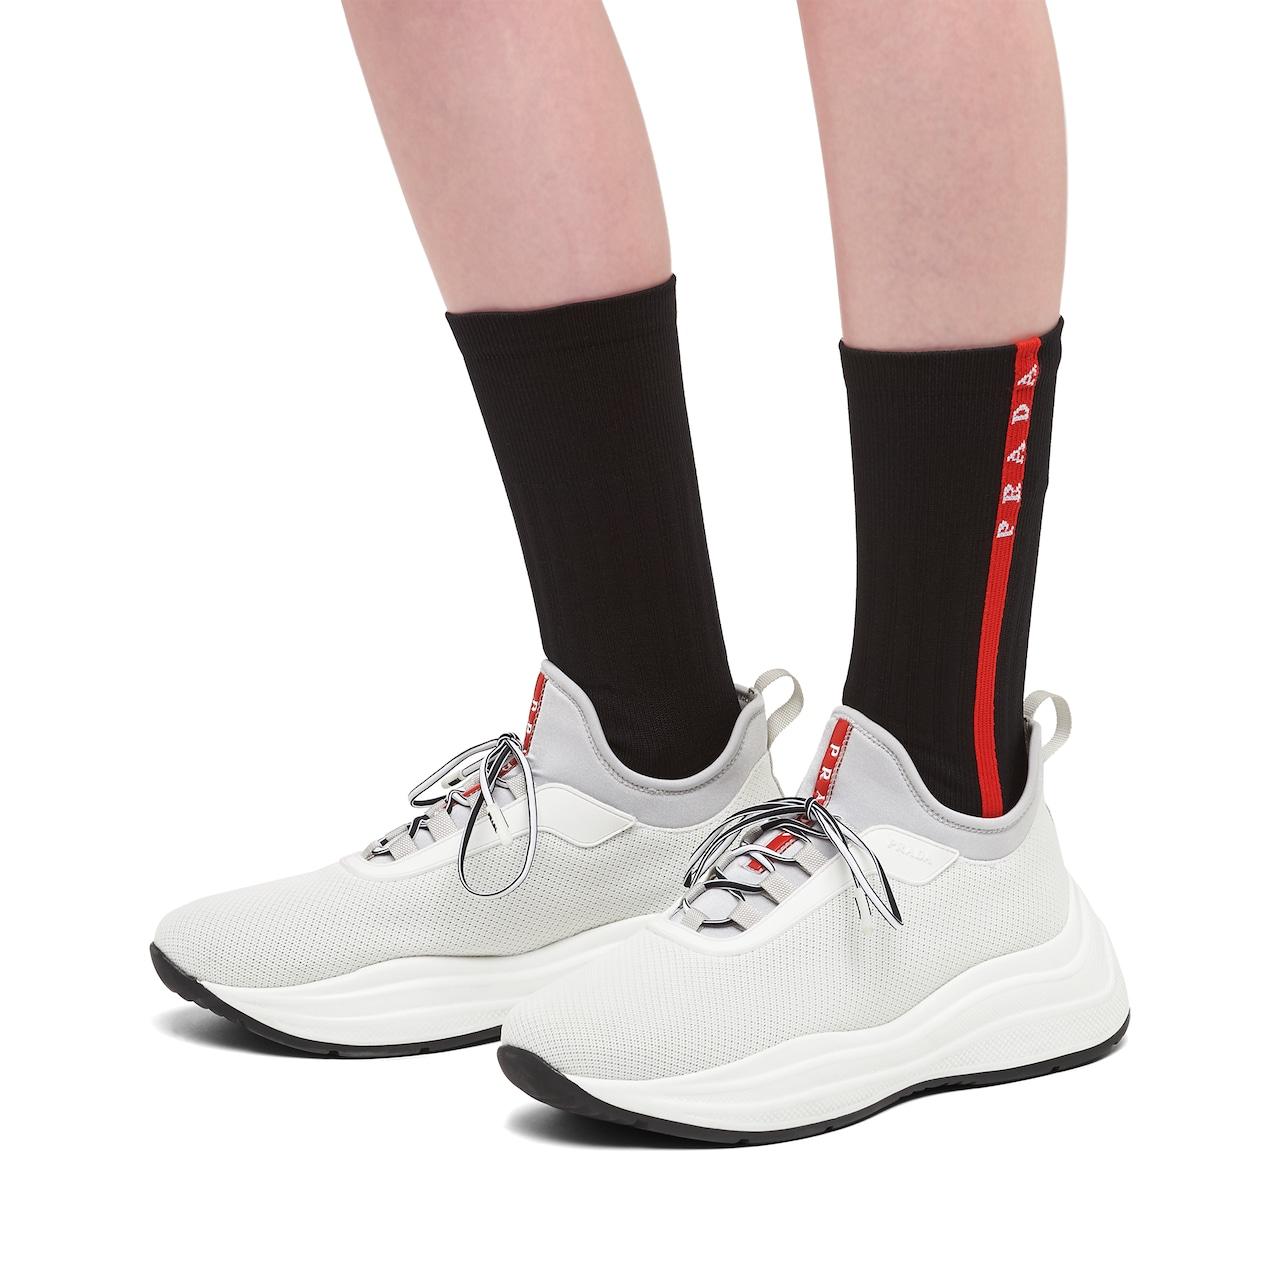 Prada Nylon socks 2